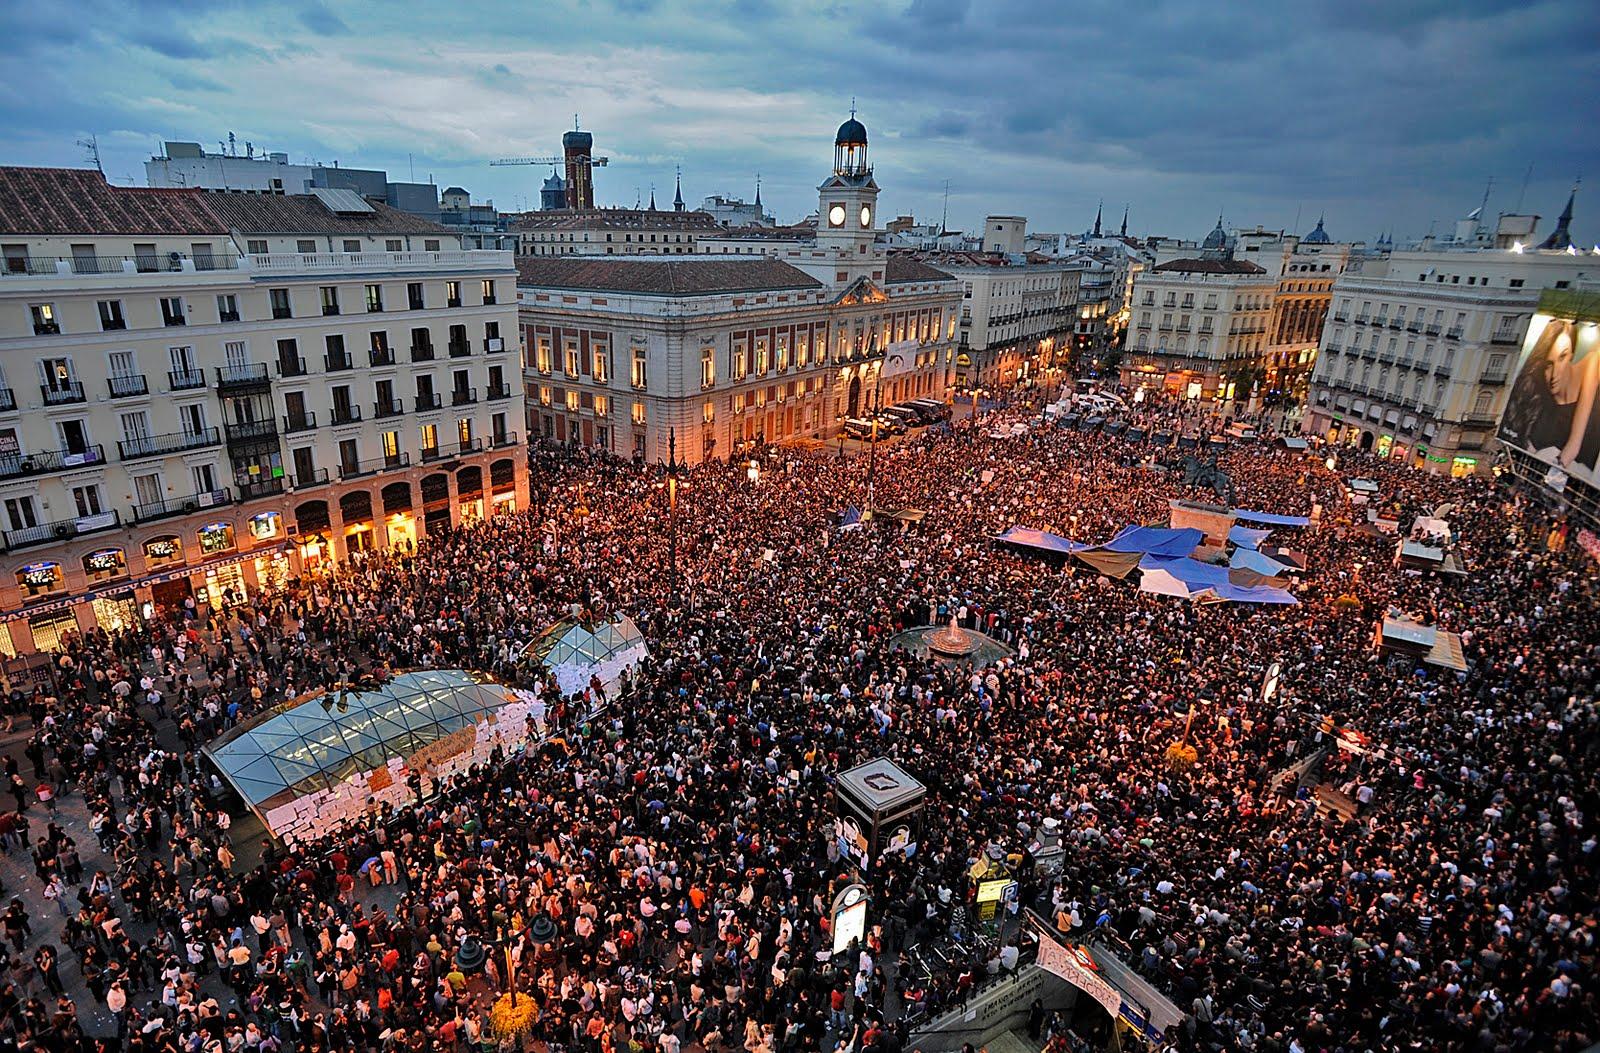 St phane hessel n a pas inspir le mouvement des indign s for Puerta 15 foro sol